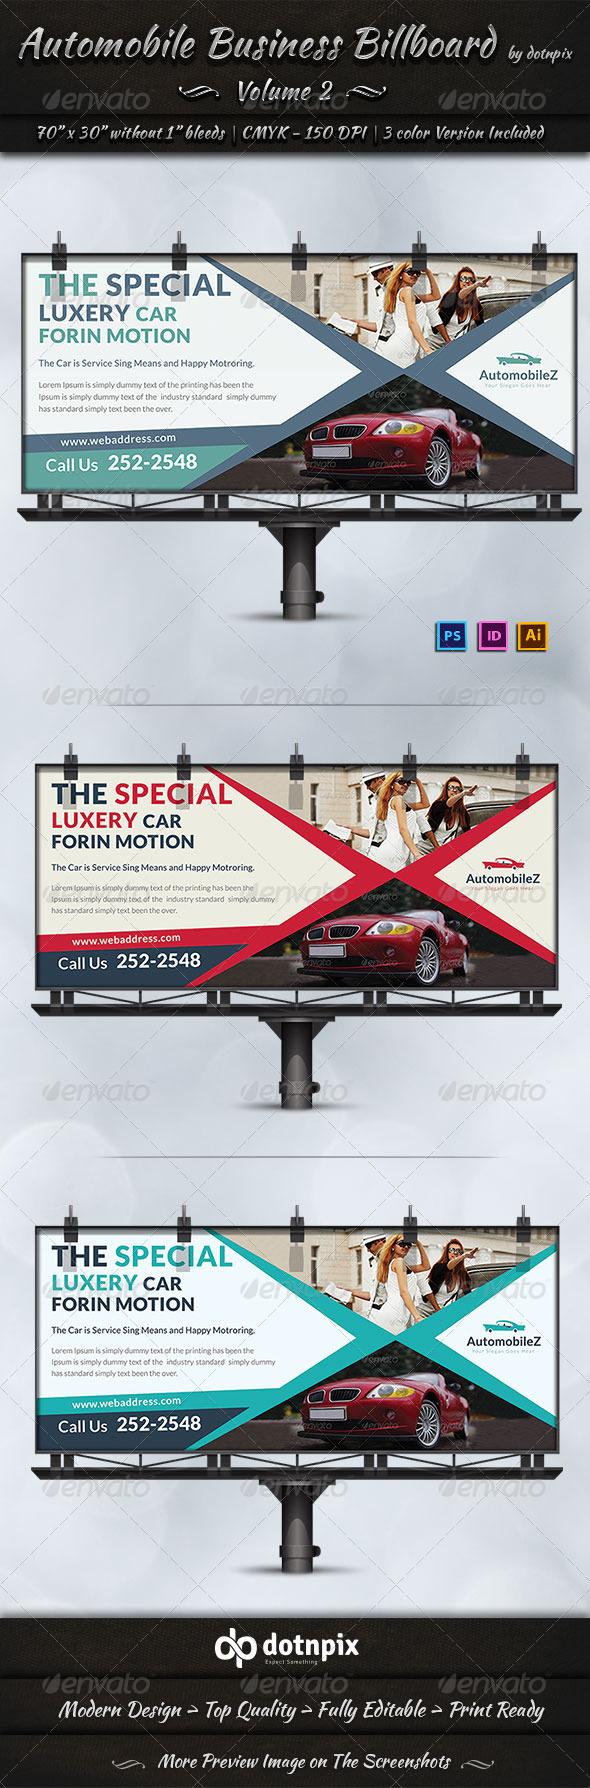 Automobile Business Billboard | Volume 2 - Signage Print Templates